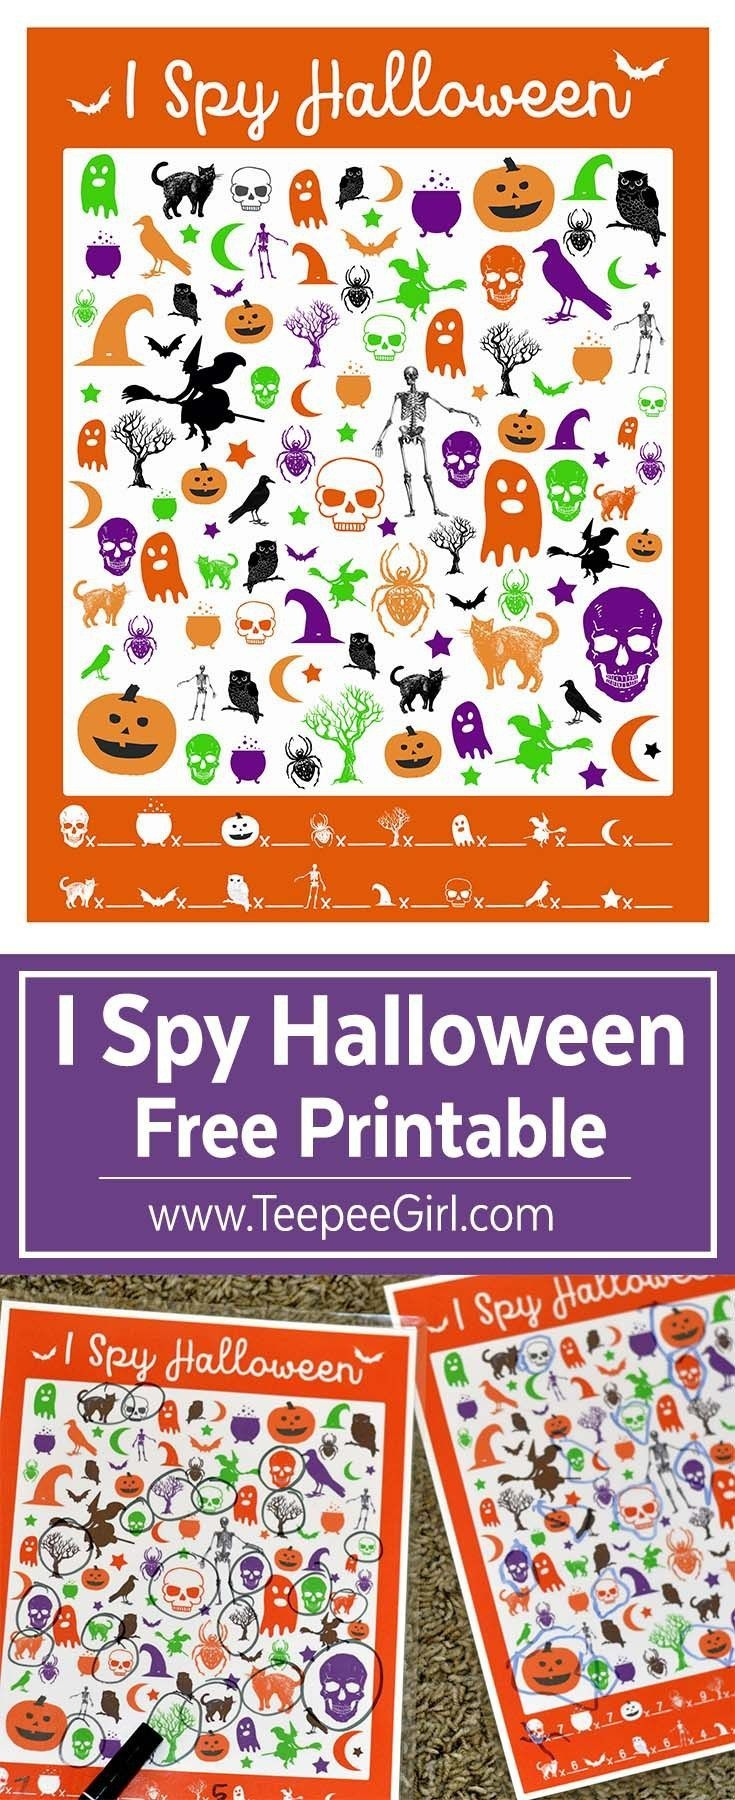 Free I Spy Halloween Game | Free Printables | Halloween Party - Free Printable Halloween Party Games